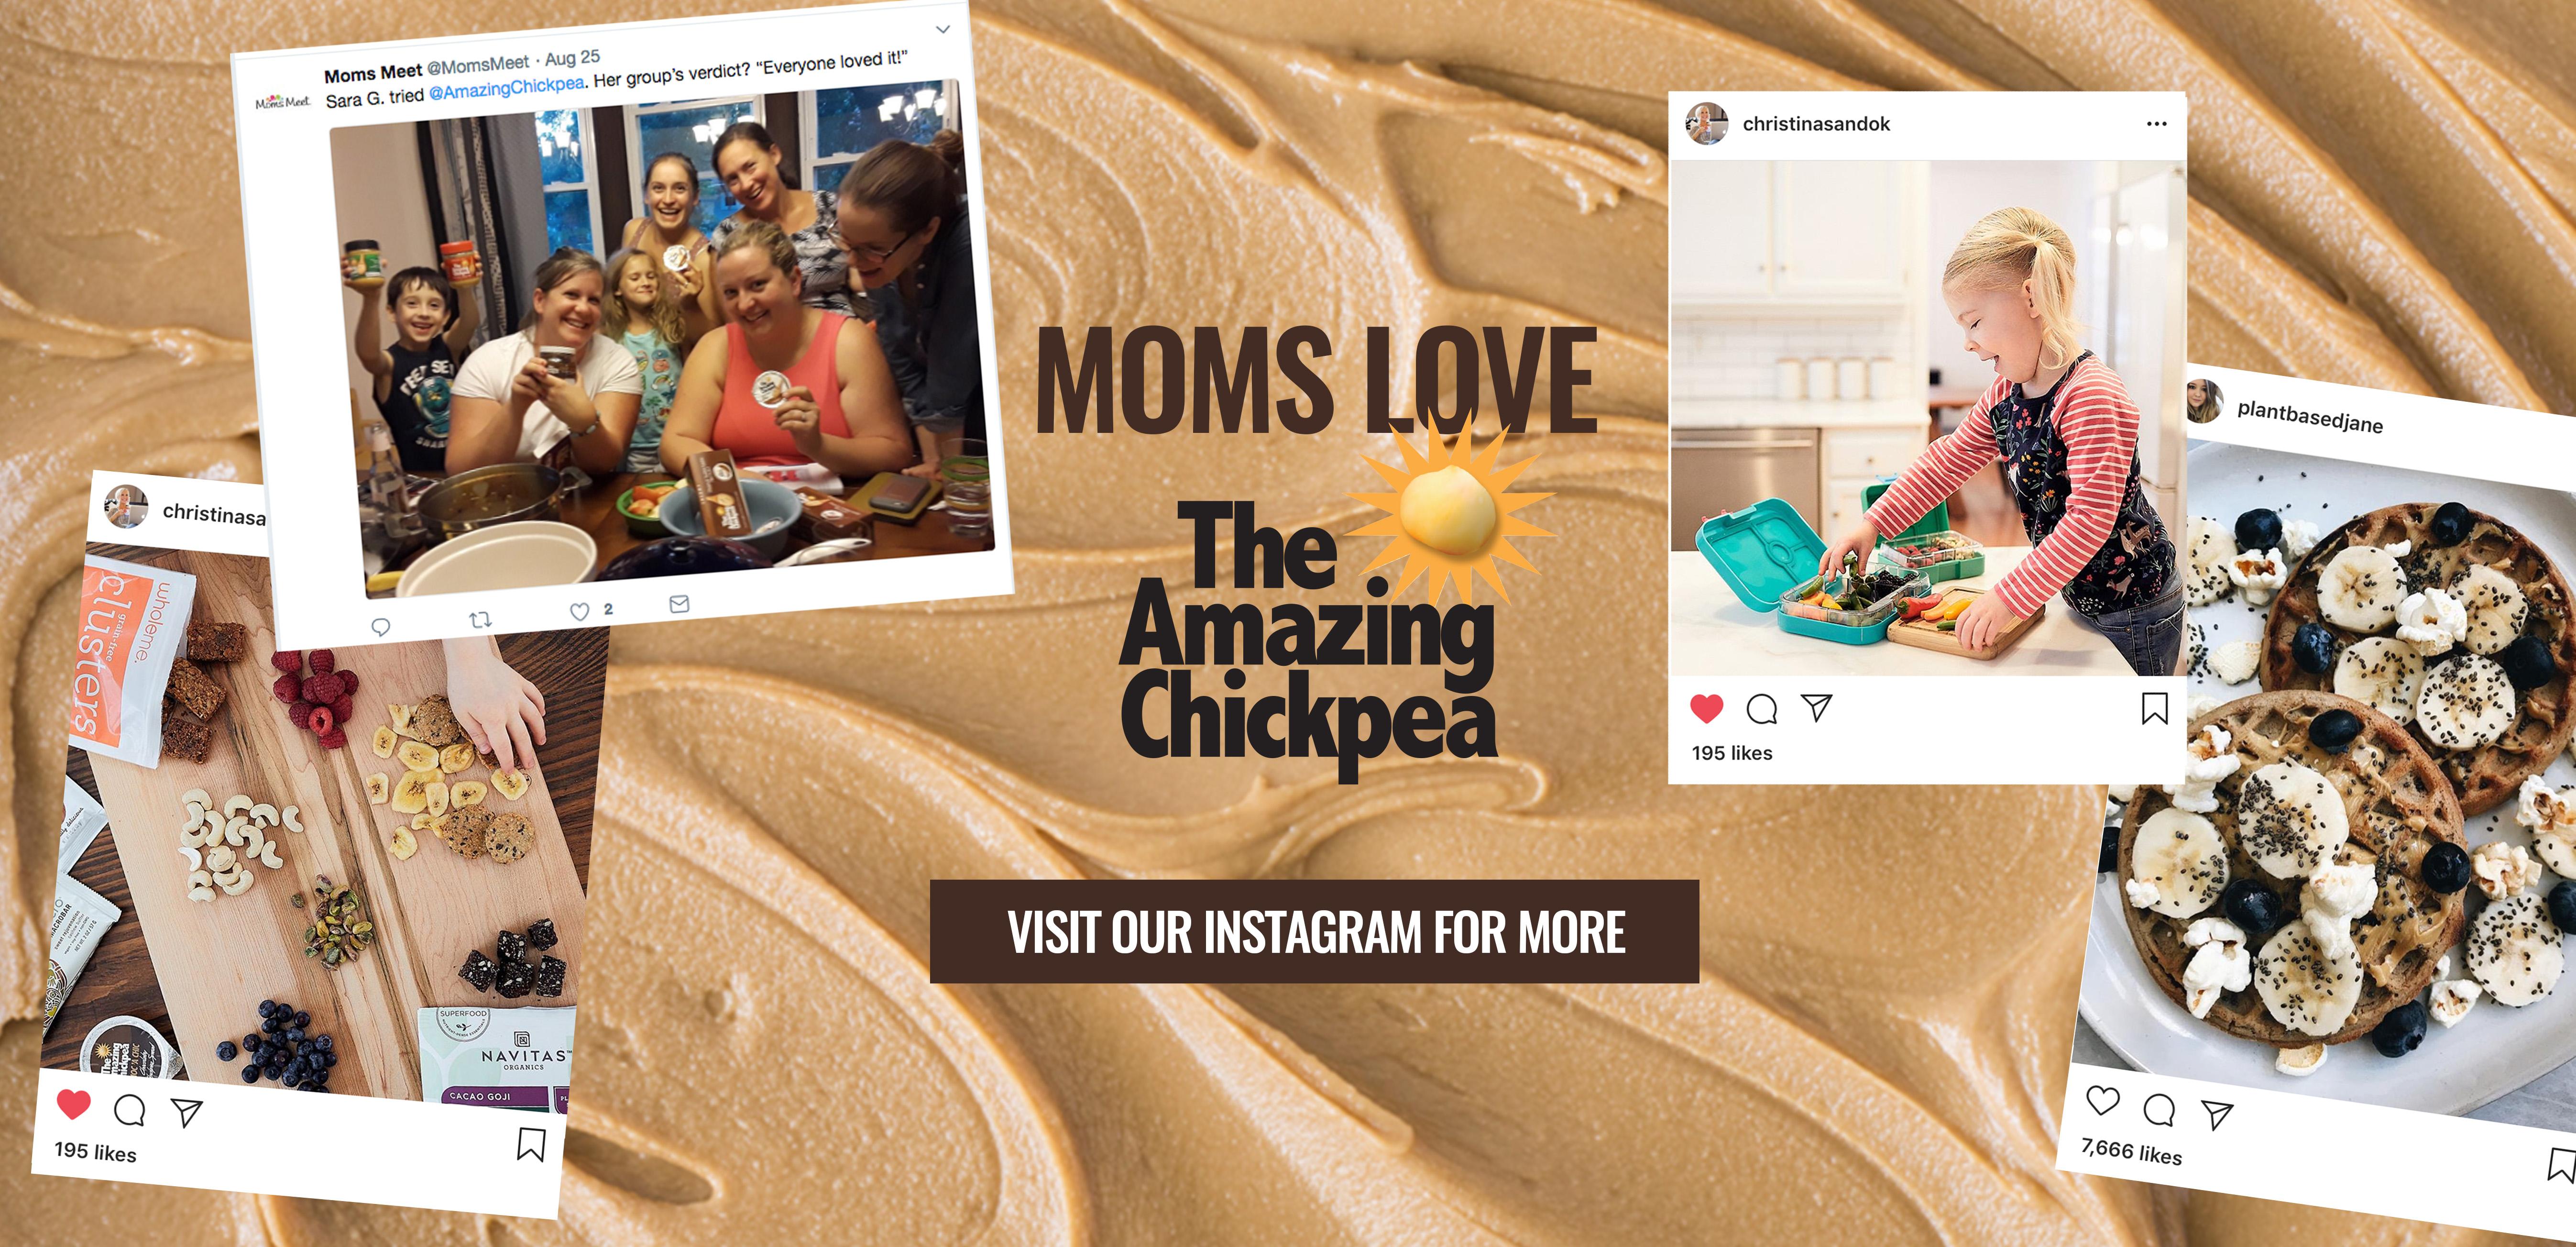 Moms Love The Amazing Chickpea!